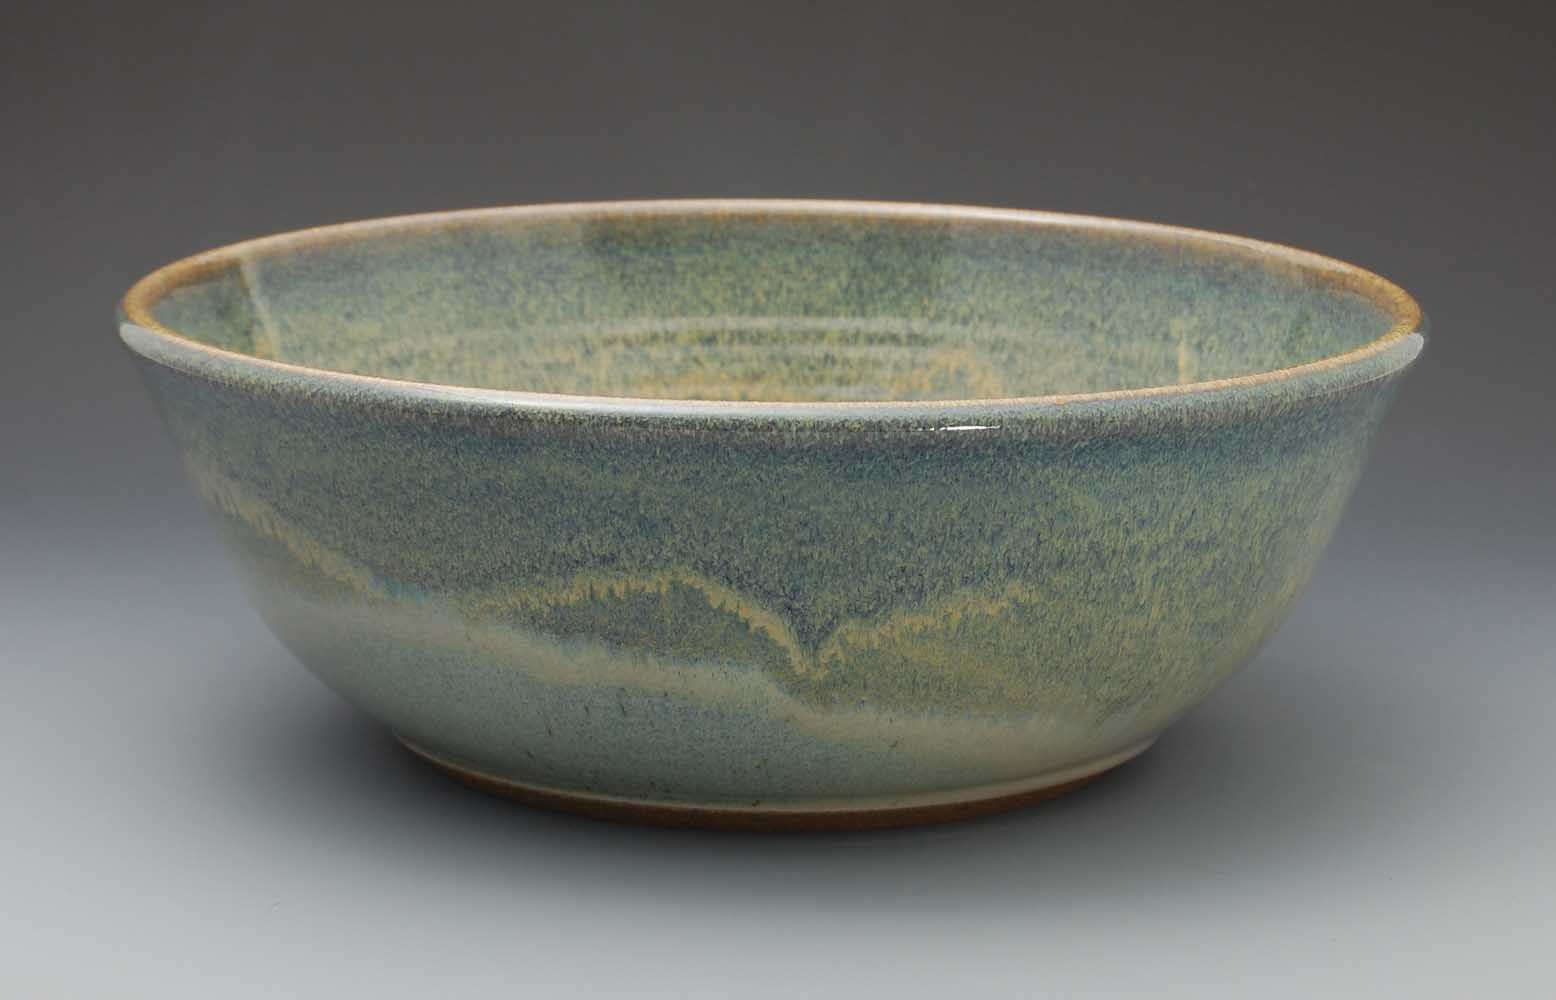 Large Bowl, Light Blue Glaze